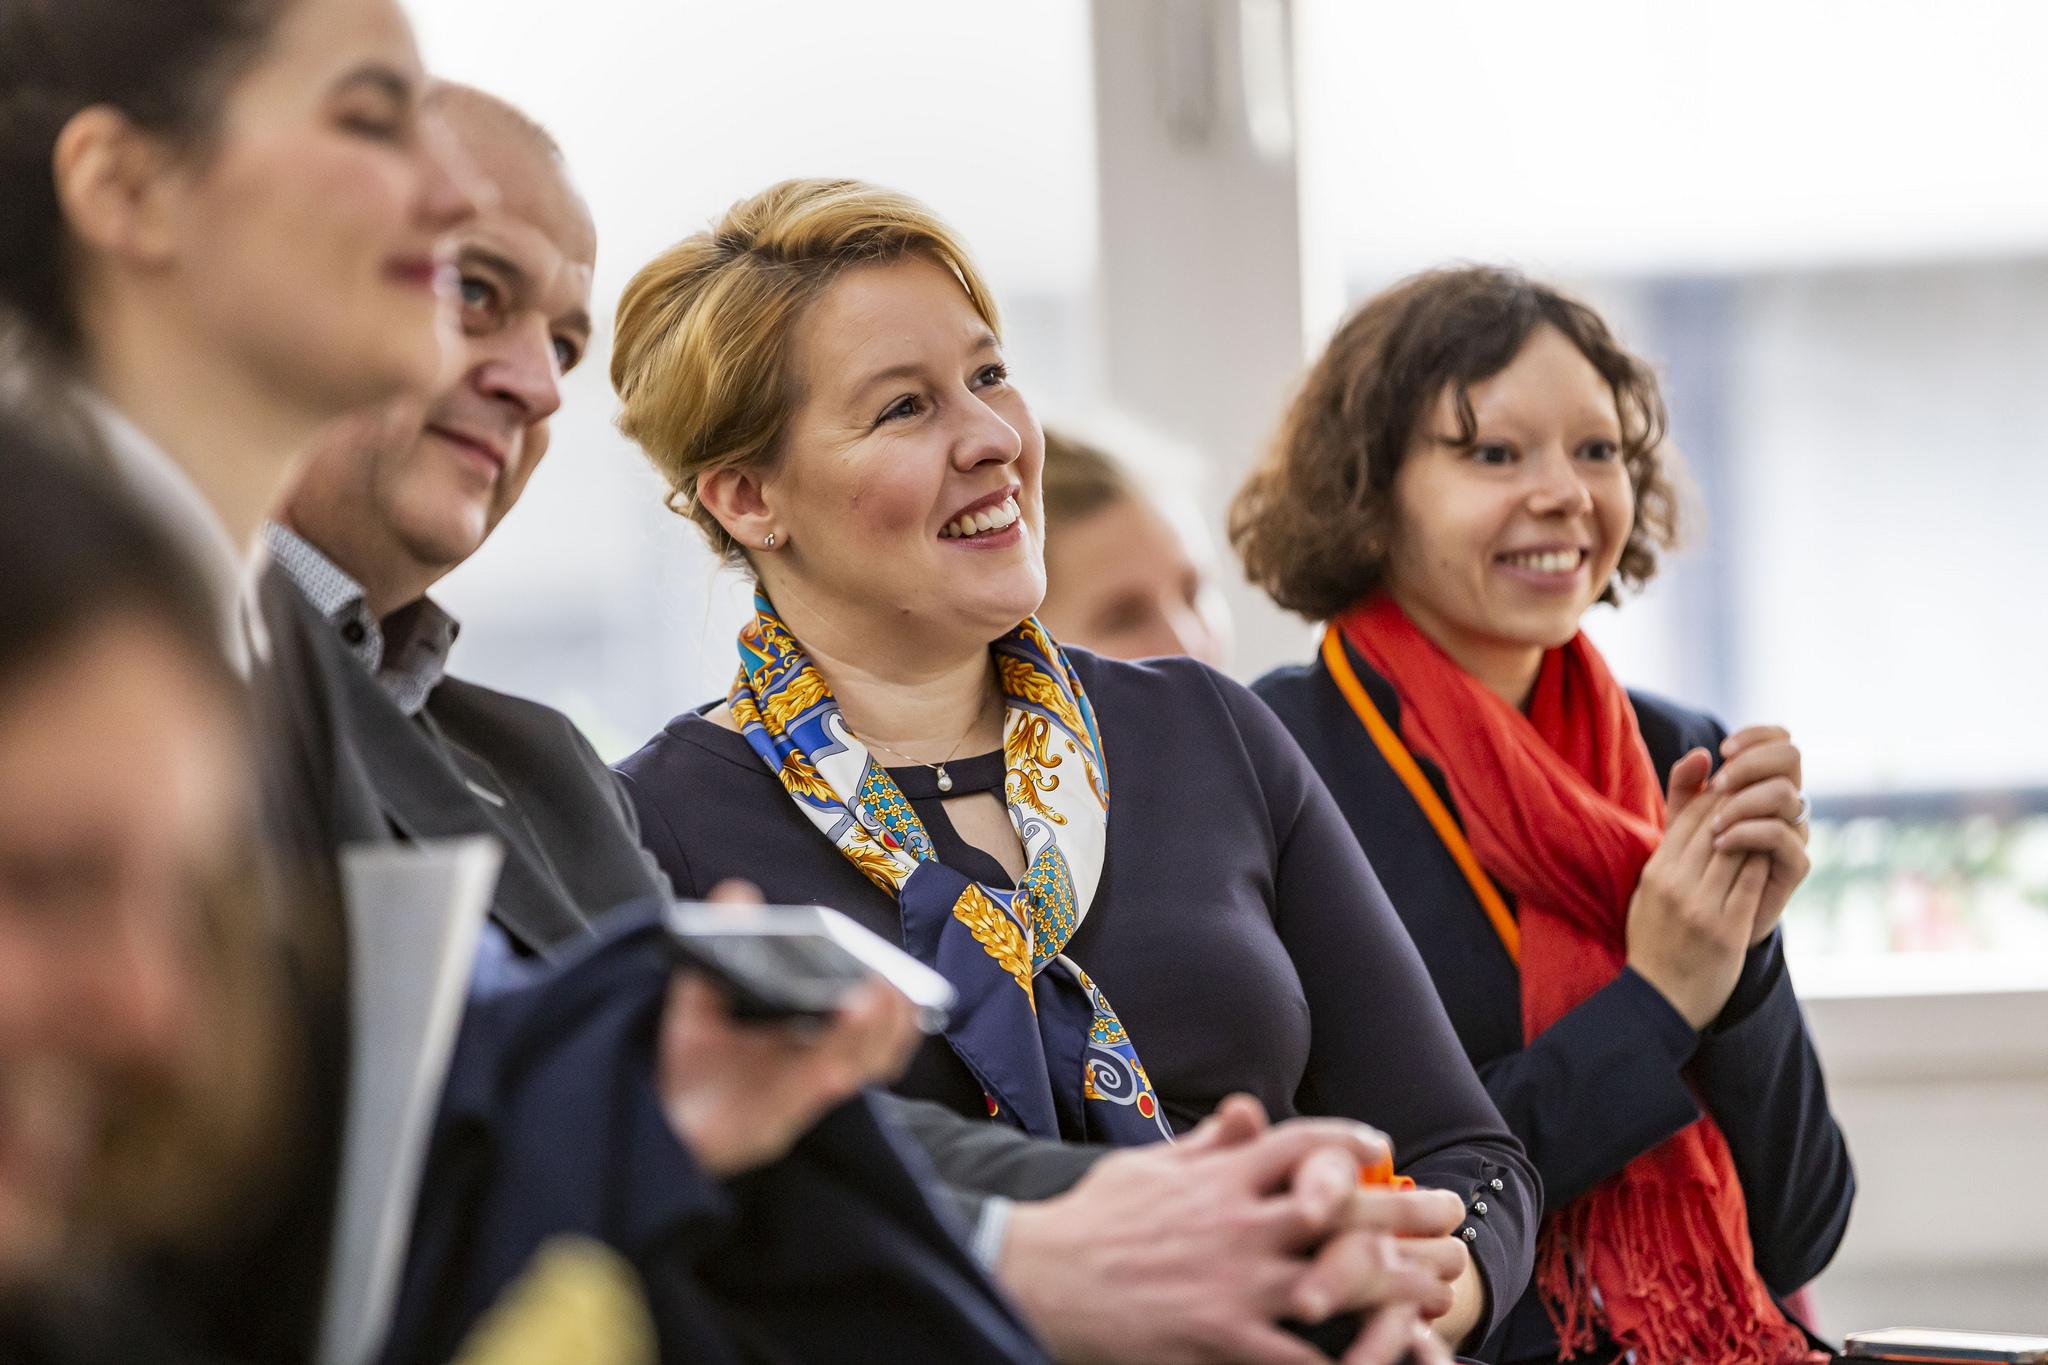 Bundesfamilienministerin Dr. Franziska Giffey beim openTransfer CAMP #Patenschaften am 1. Dezember 2018 in Berlin.